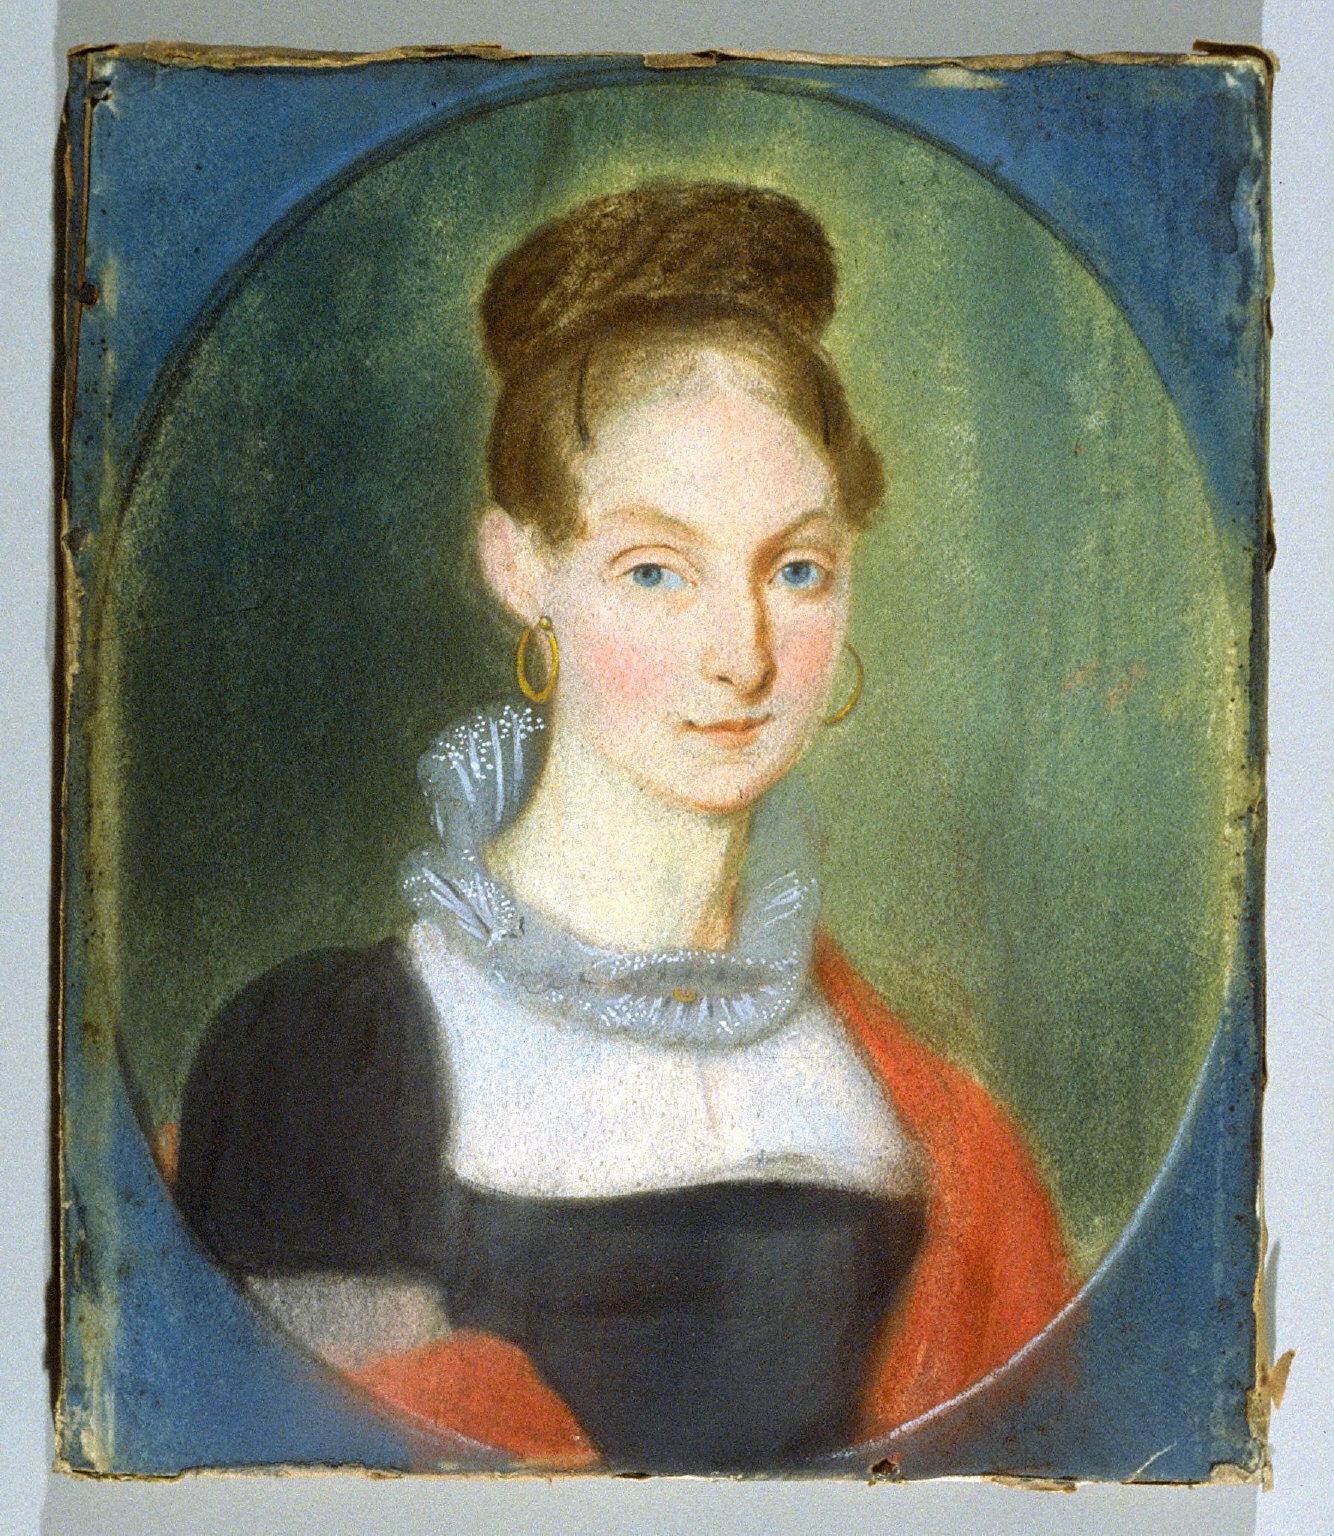 Portrait of Mrs. Susanna Hoeffer (d. 29 Feb. 1860)